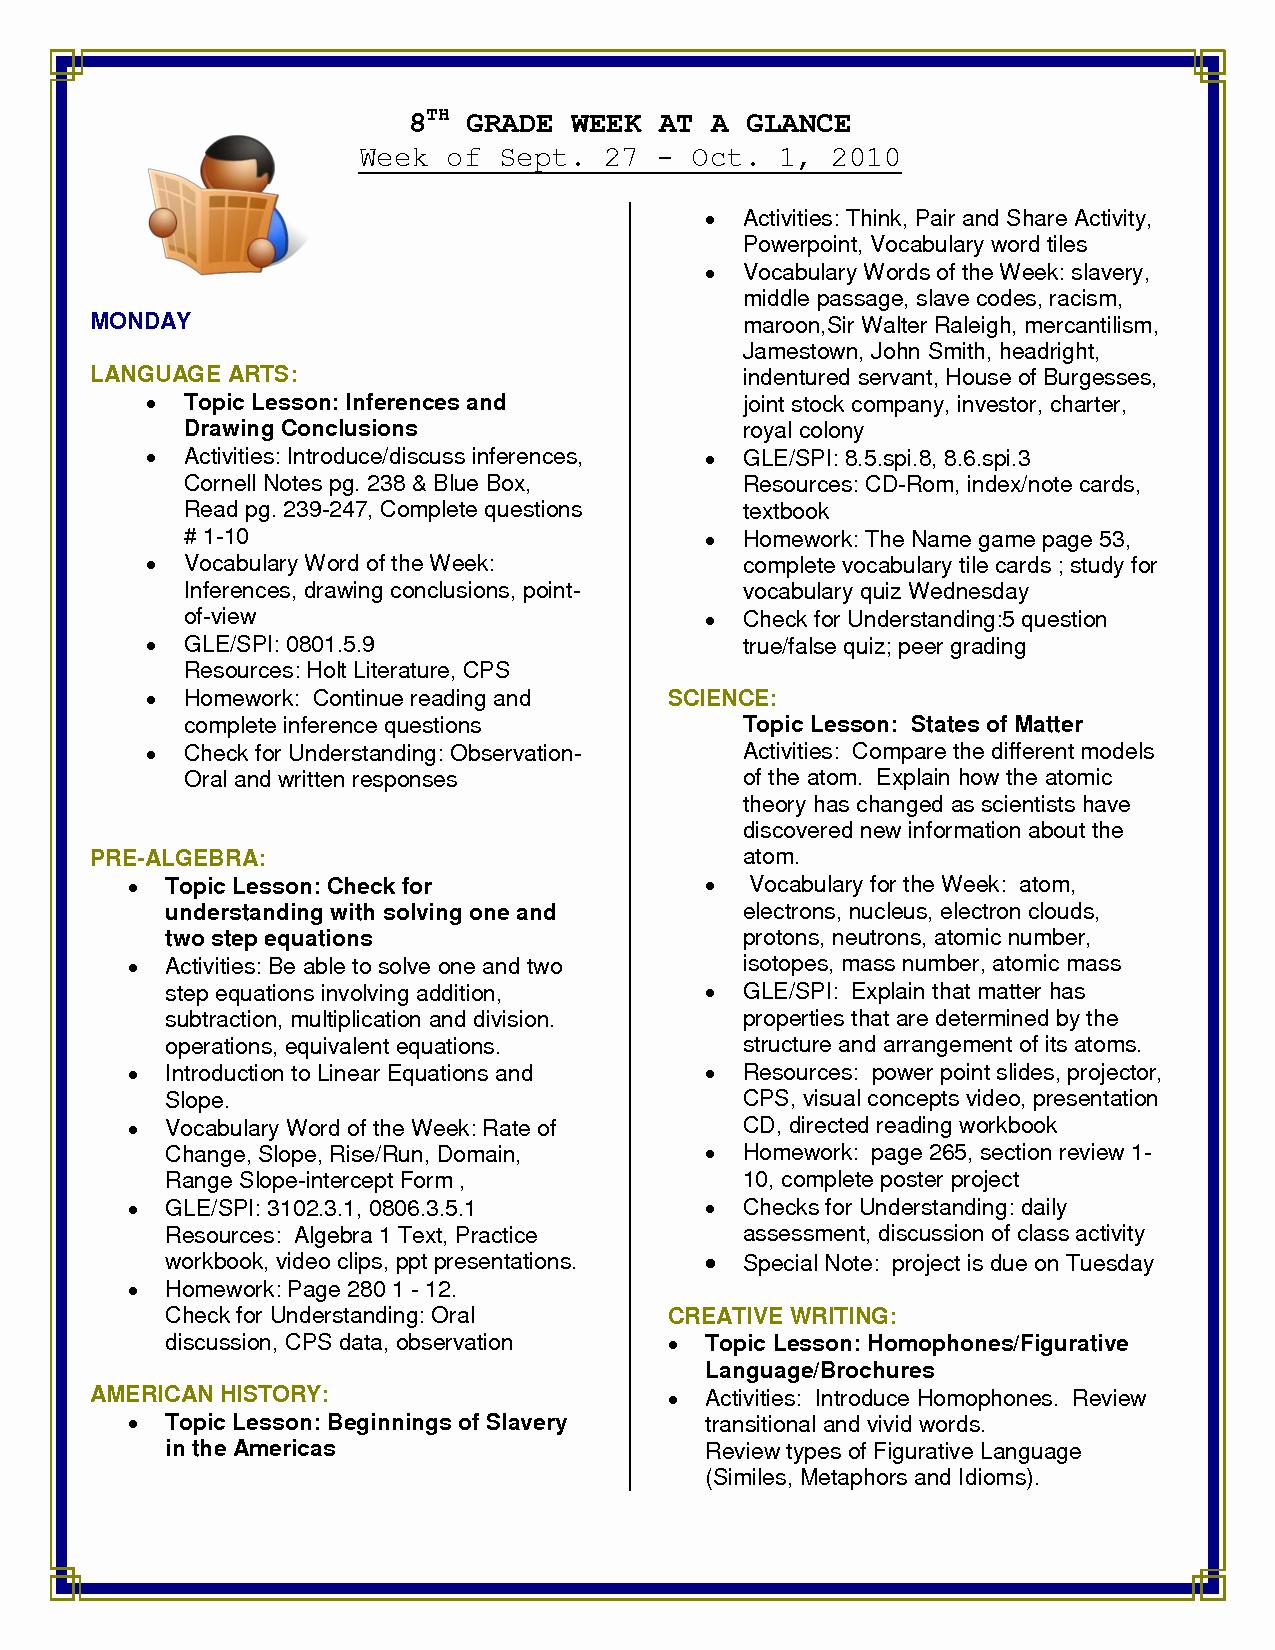 Free Printable Language Arts Worksheets 7th Grade